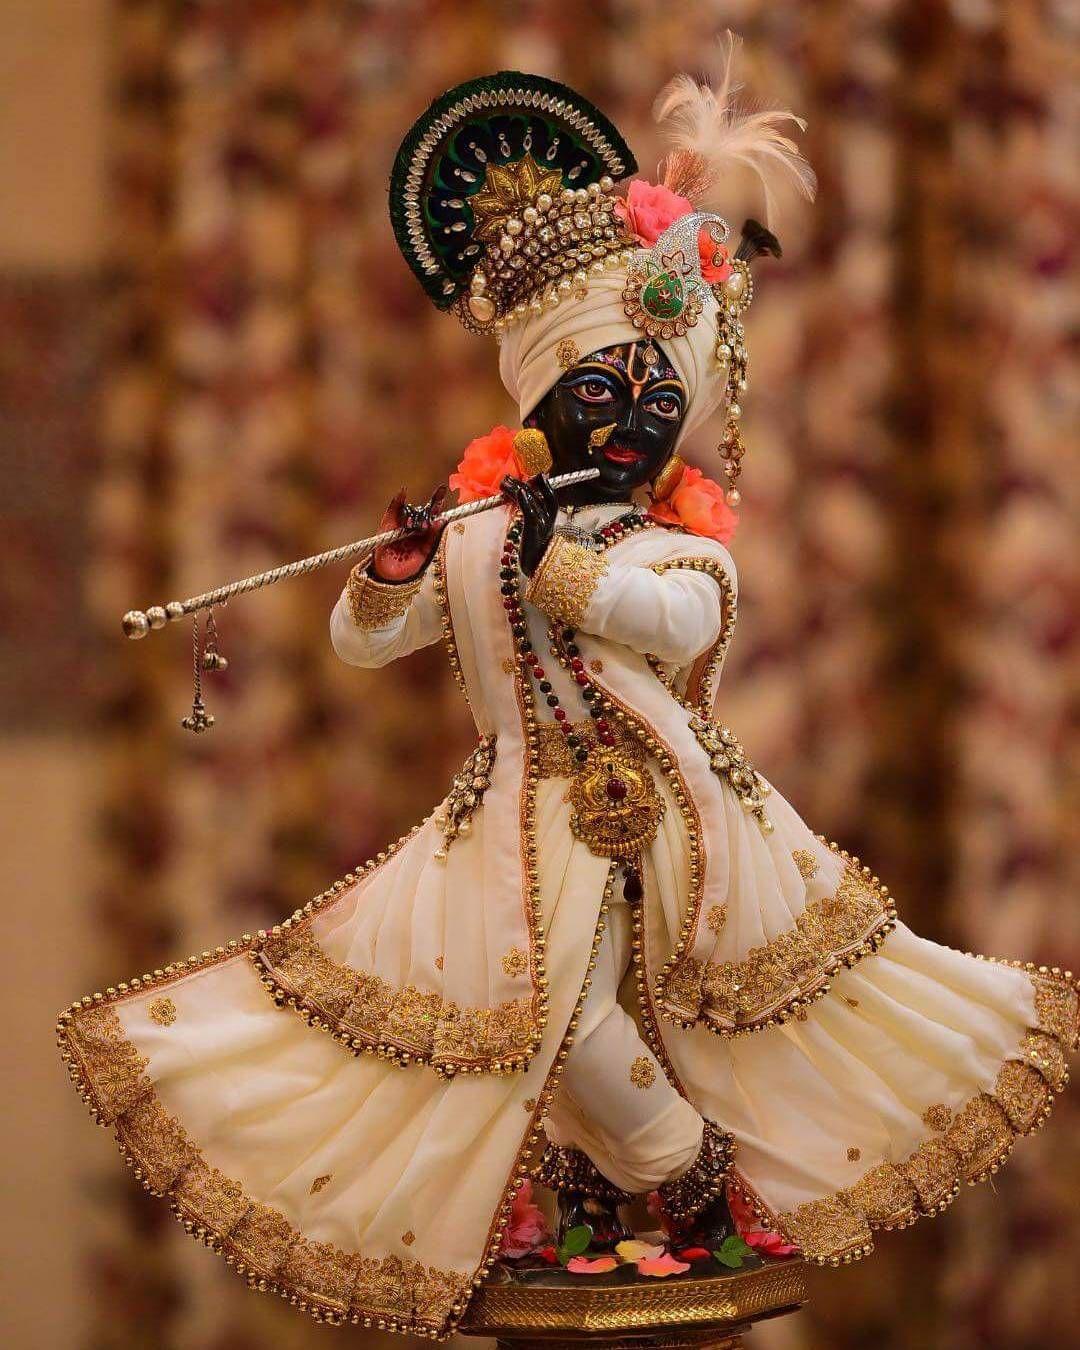 Arjun S Grief And Plea For Mercy Krishna Images Iskcon Krishna Radhe Krishna Wallpapers